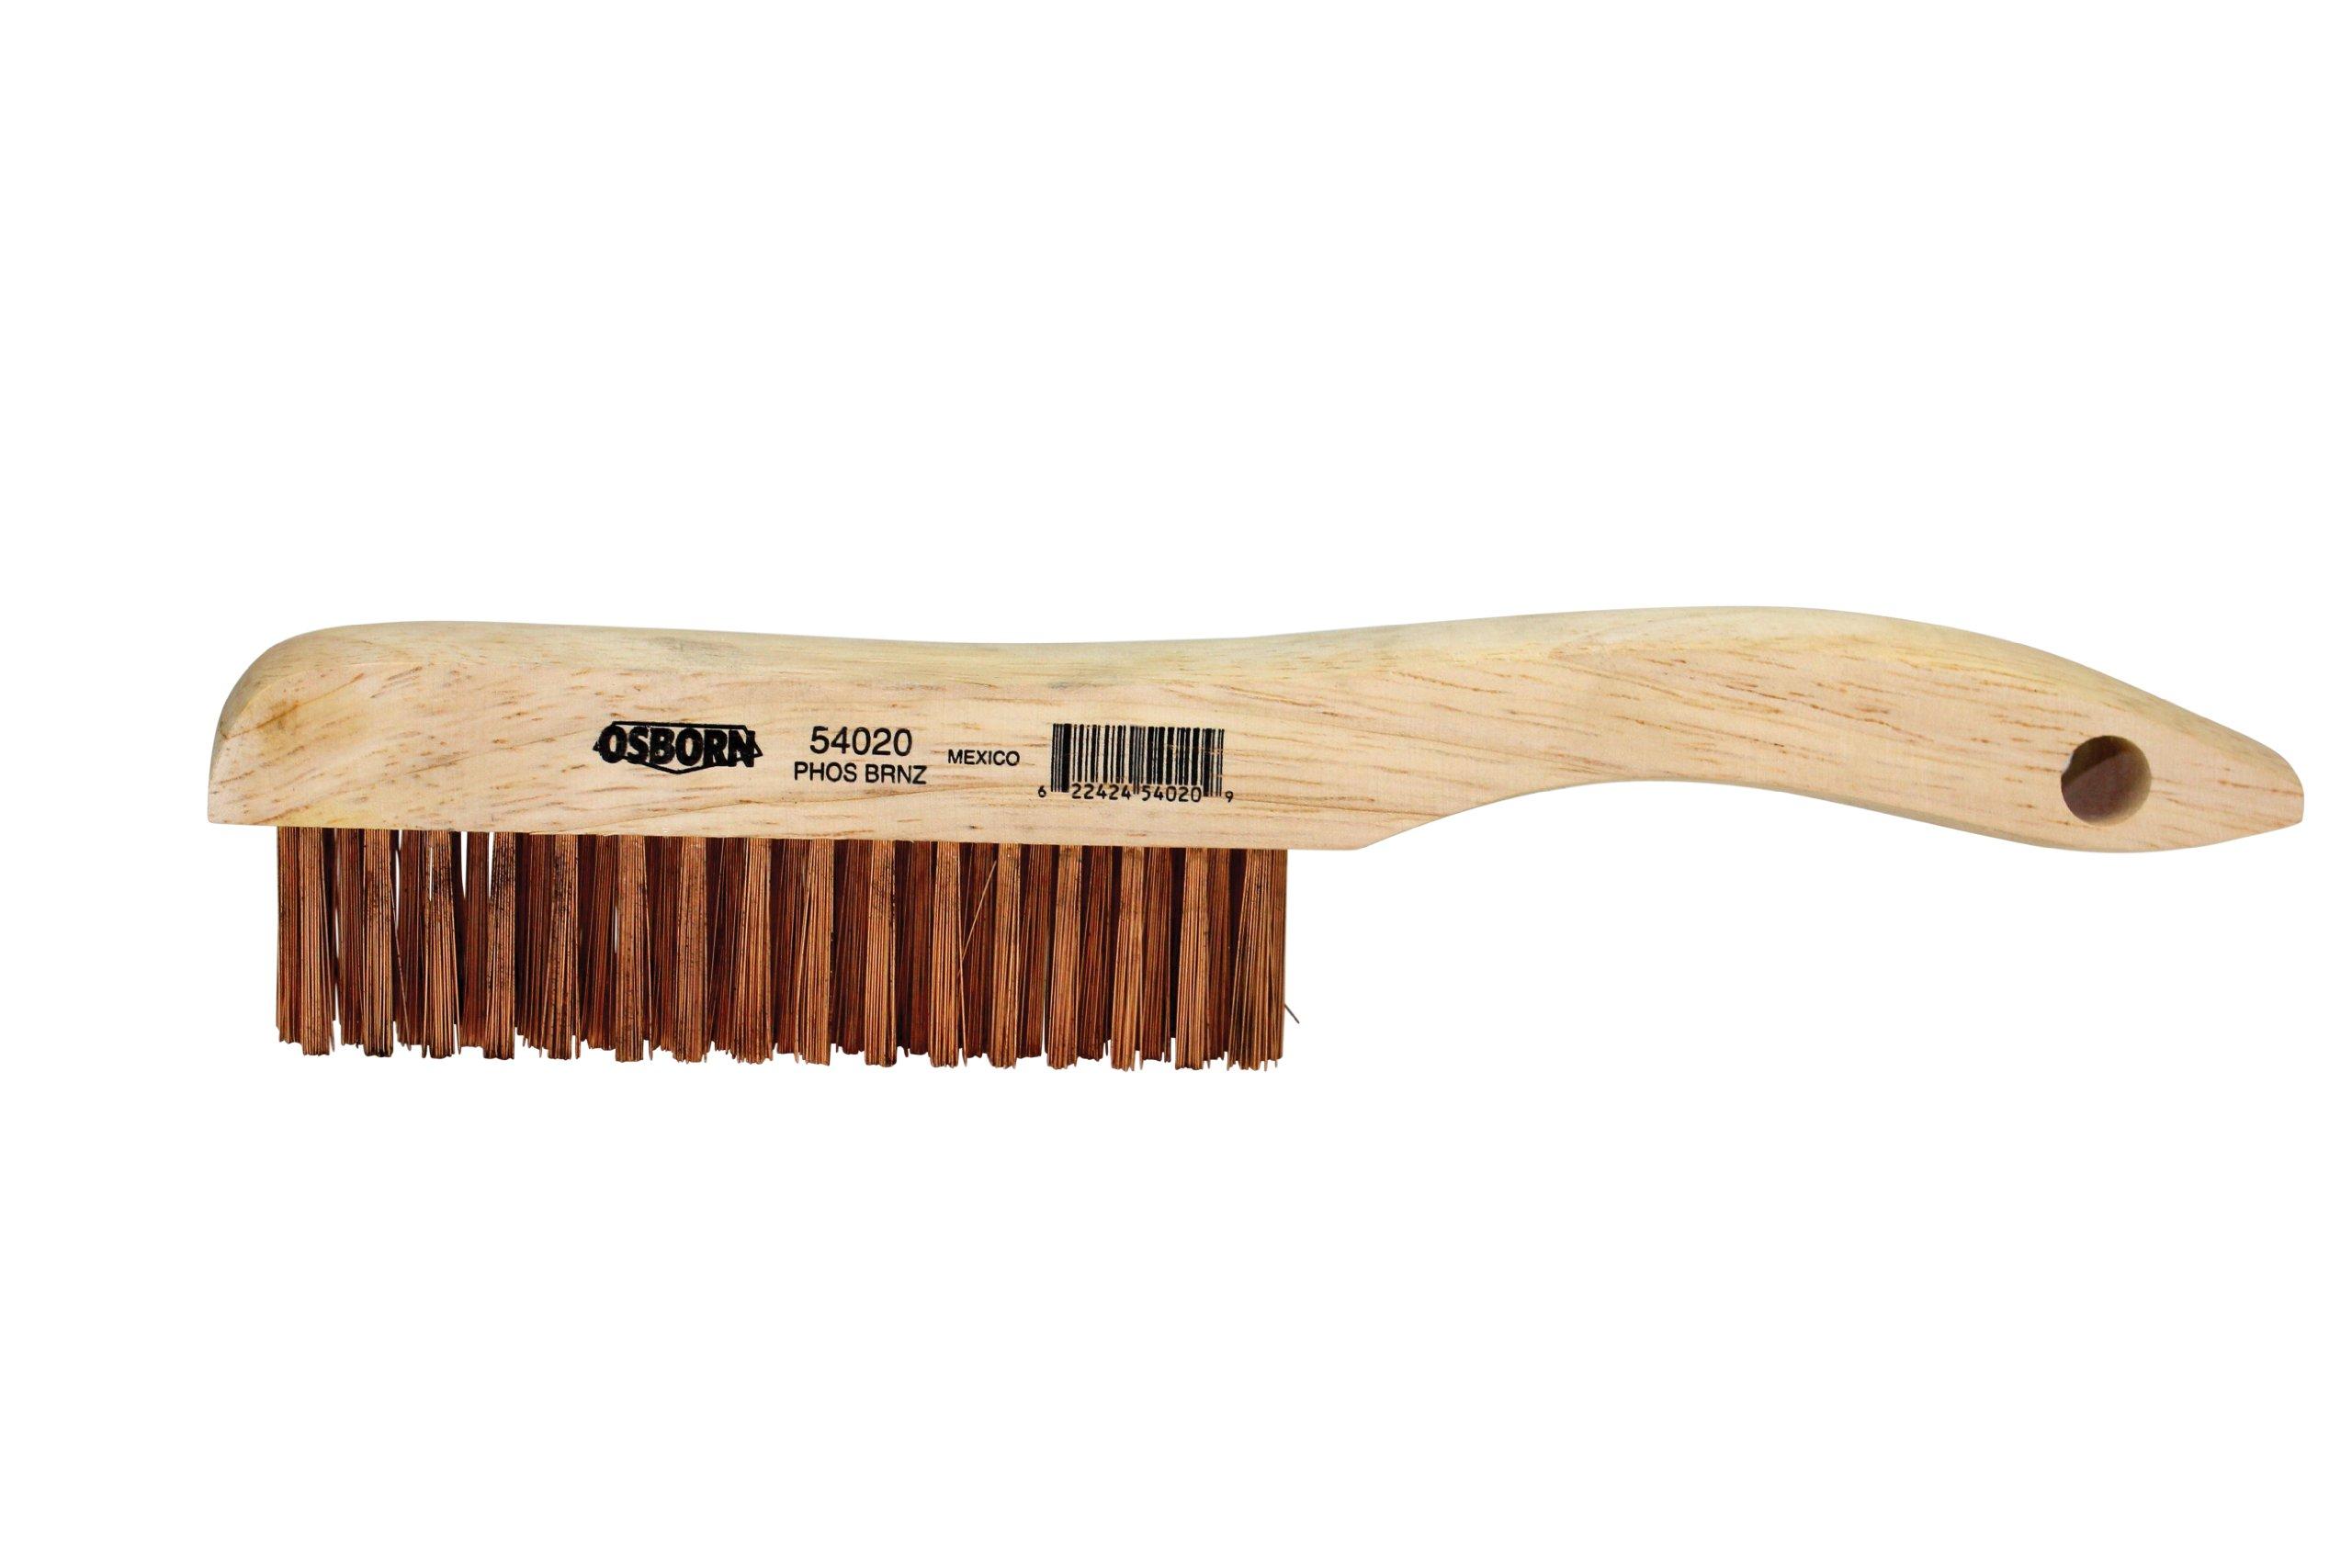 Osborn 54020 Shoe Handle Wire Scratch Brush, Phosphorous Bronze Bristle, 5-1/4'' Length, 1-1/8'' Block Width, 10'' Overall Length